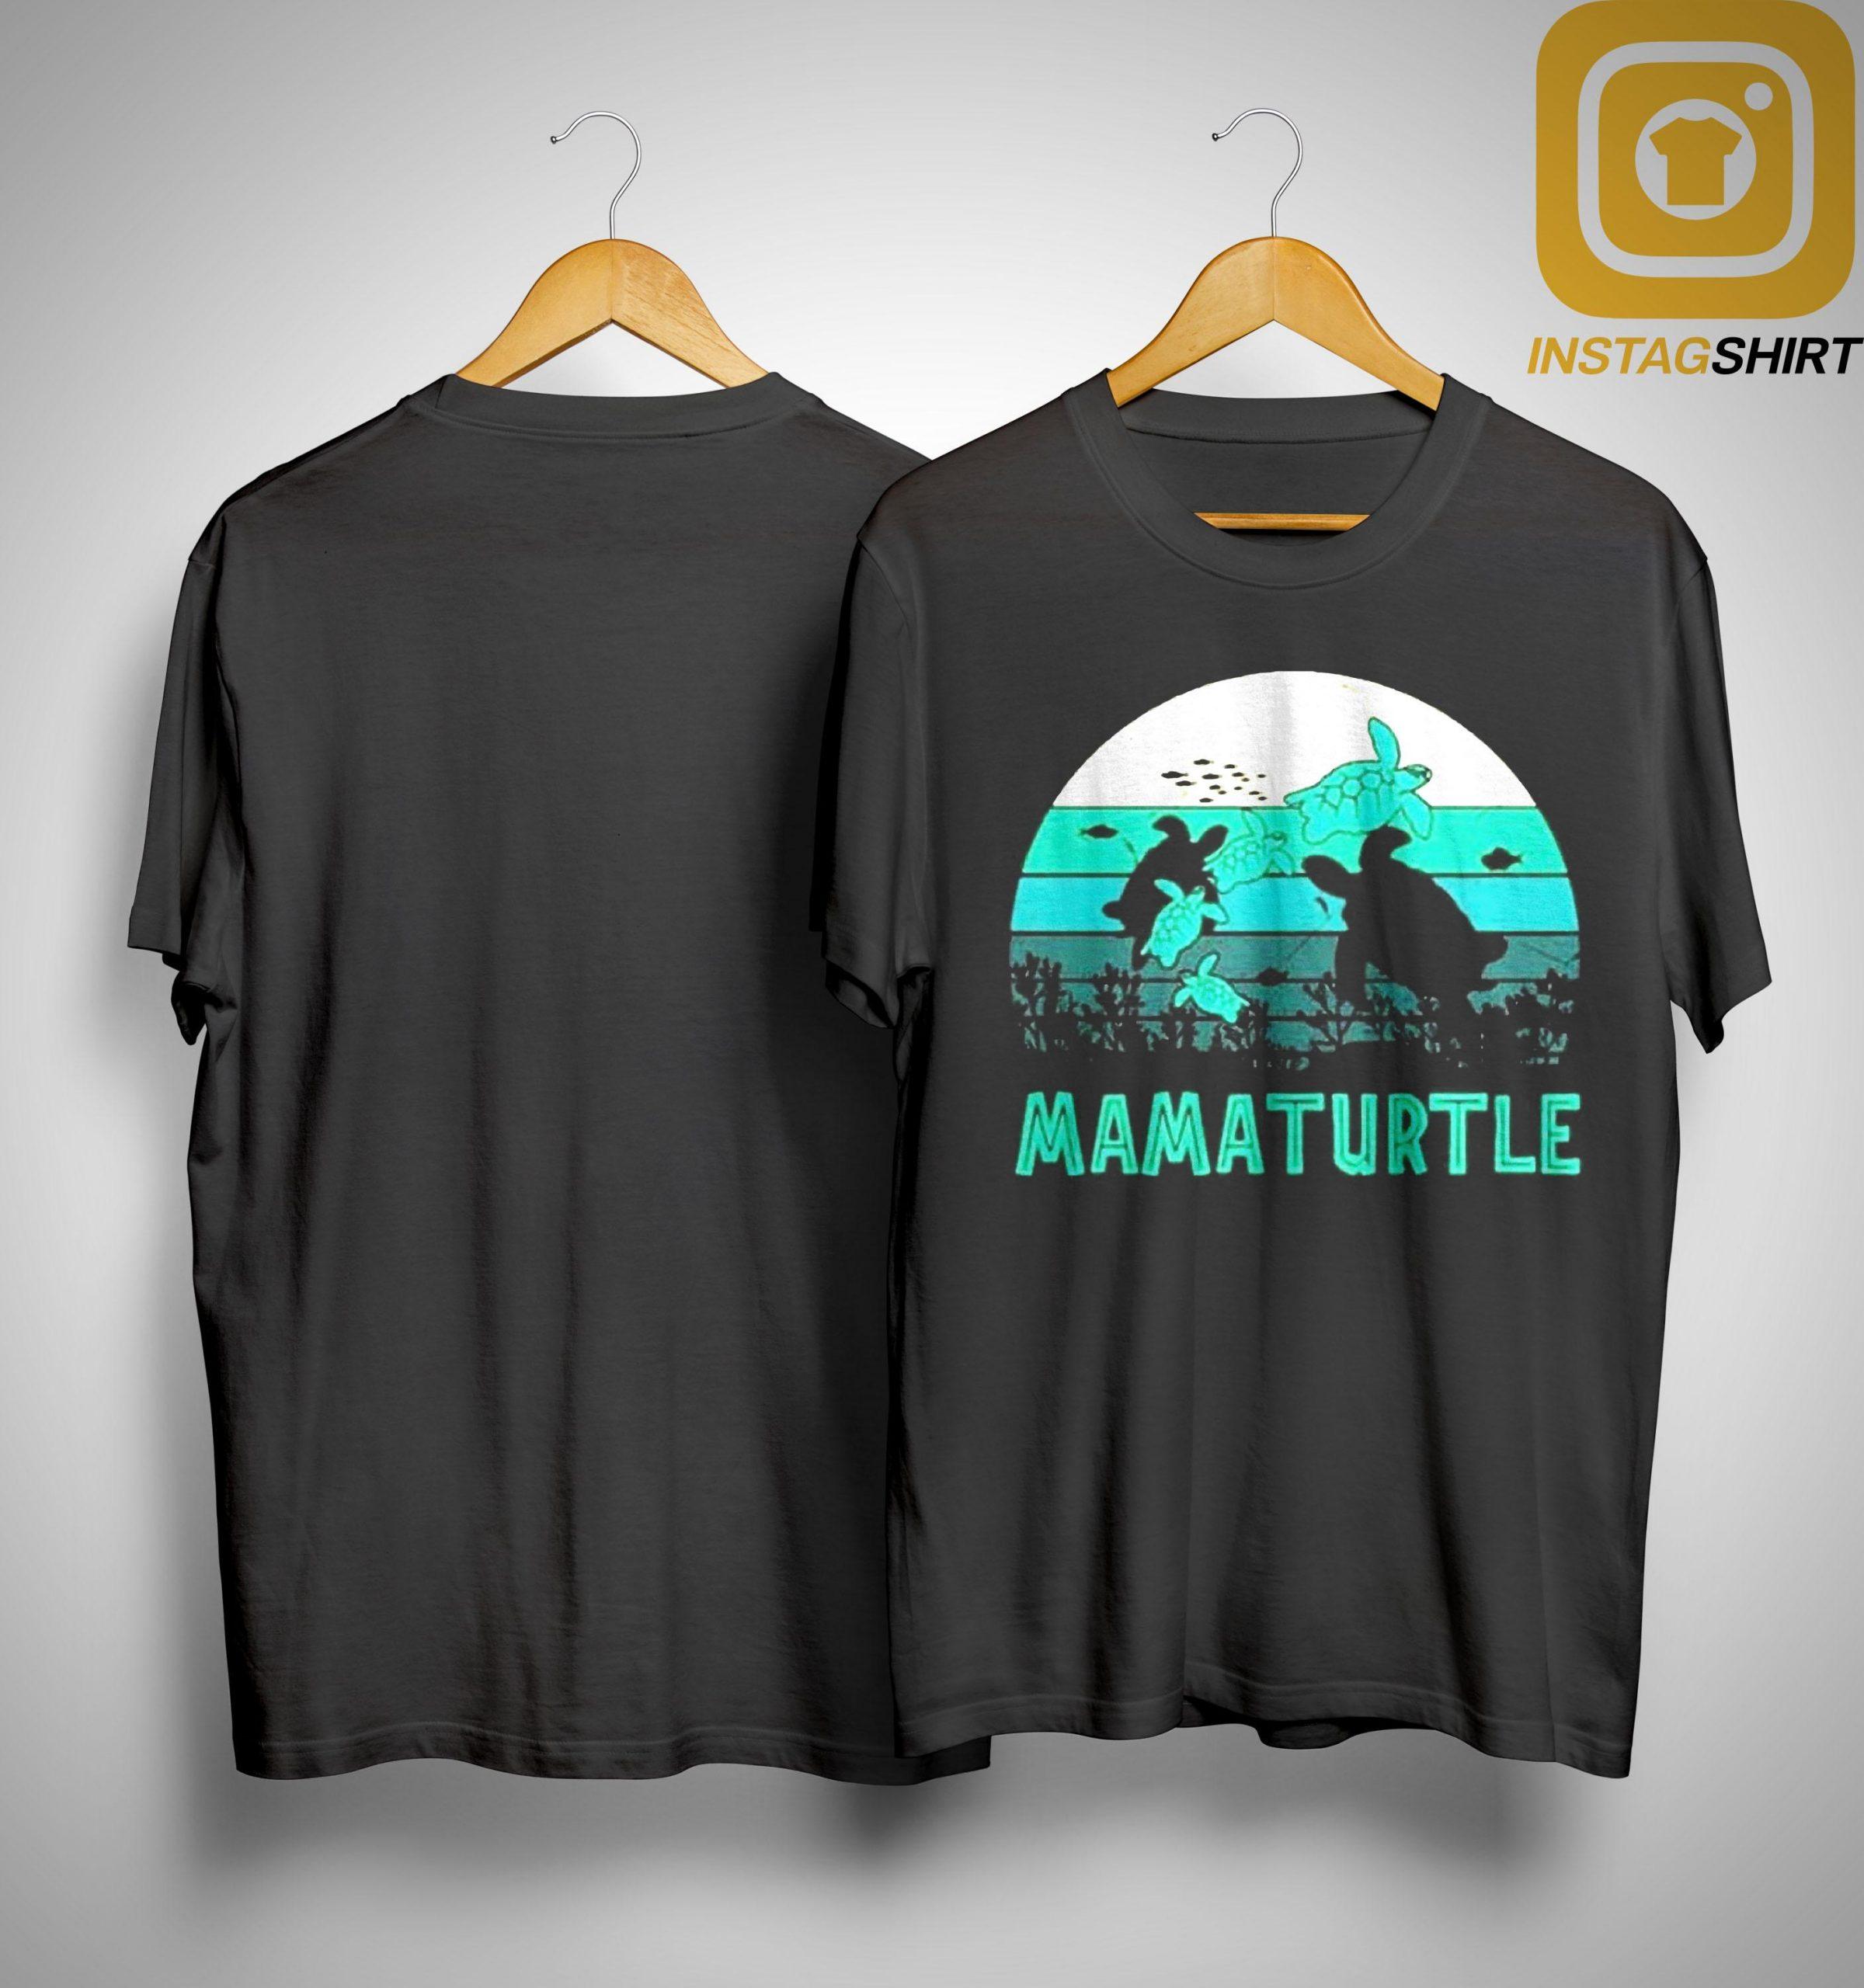 Vintage Mamaturtle Shirt